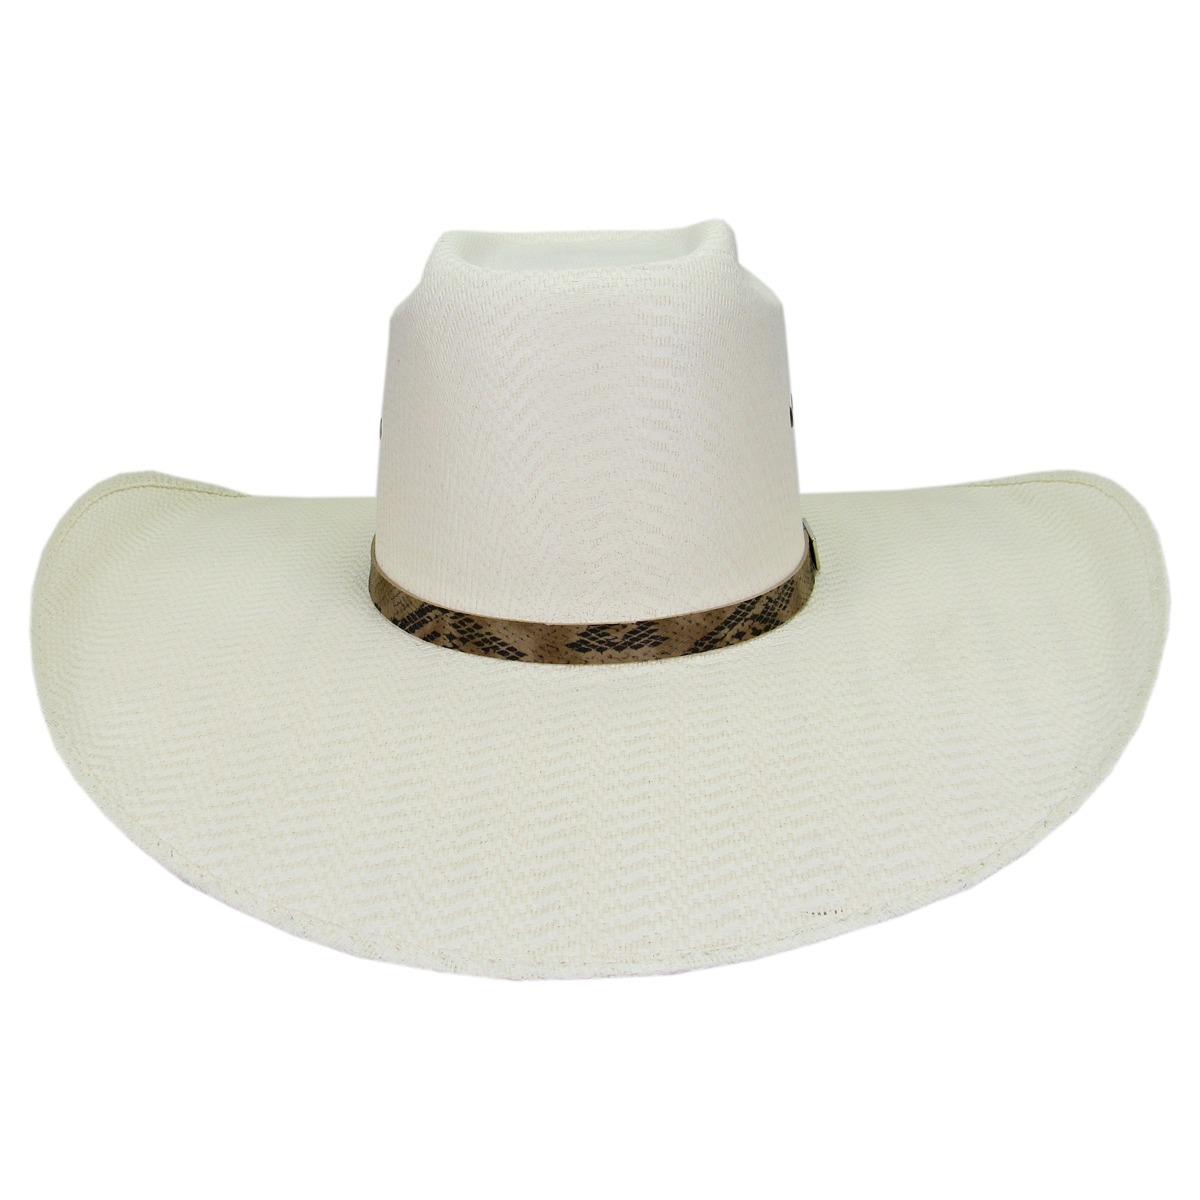 Carregando zoom... masculino country chapéu. Carregando zoom... chapéu  masculino country balada feminino sertanejo aba 12 ffa9e01fe5e